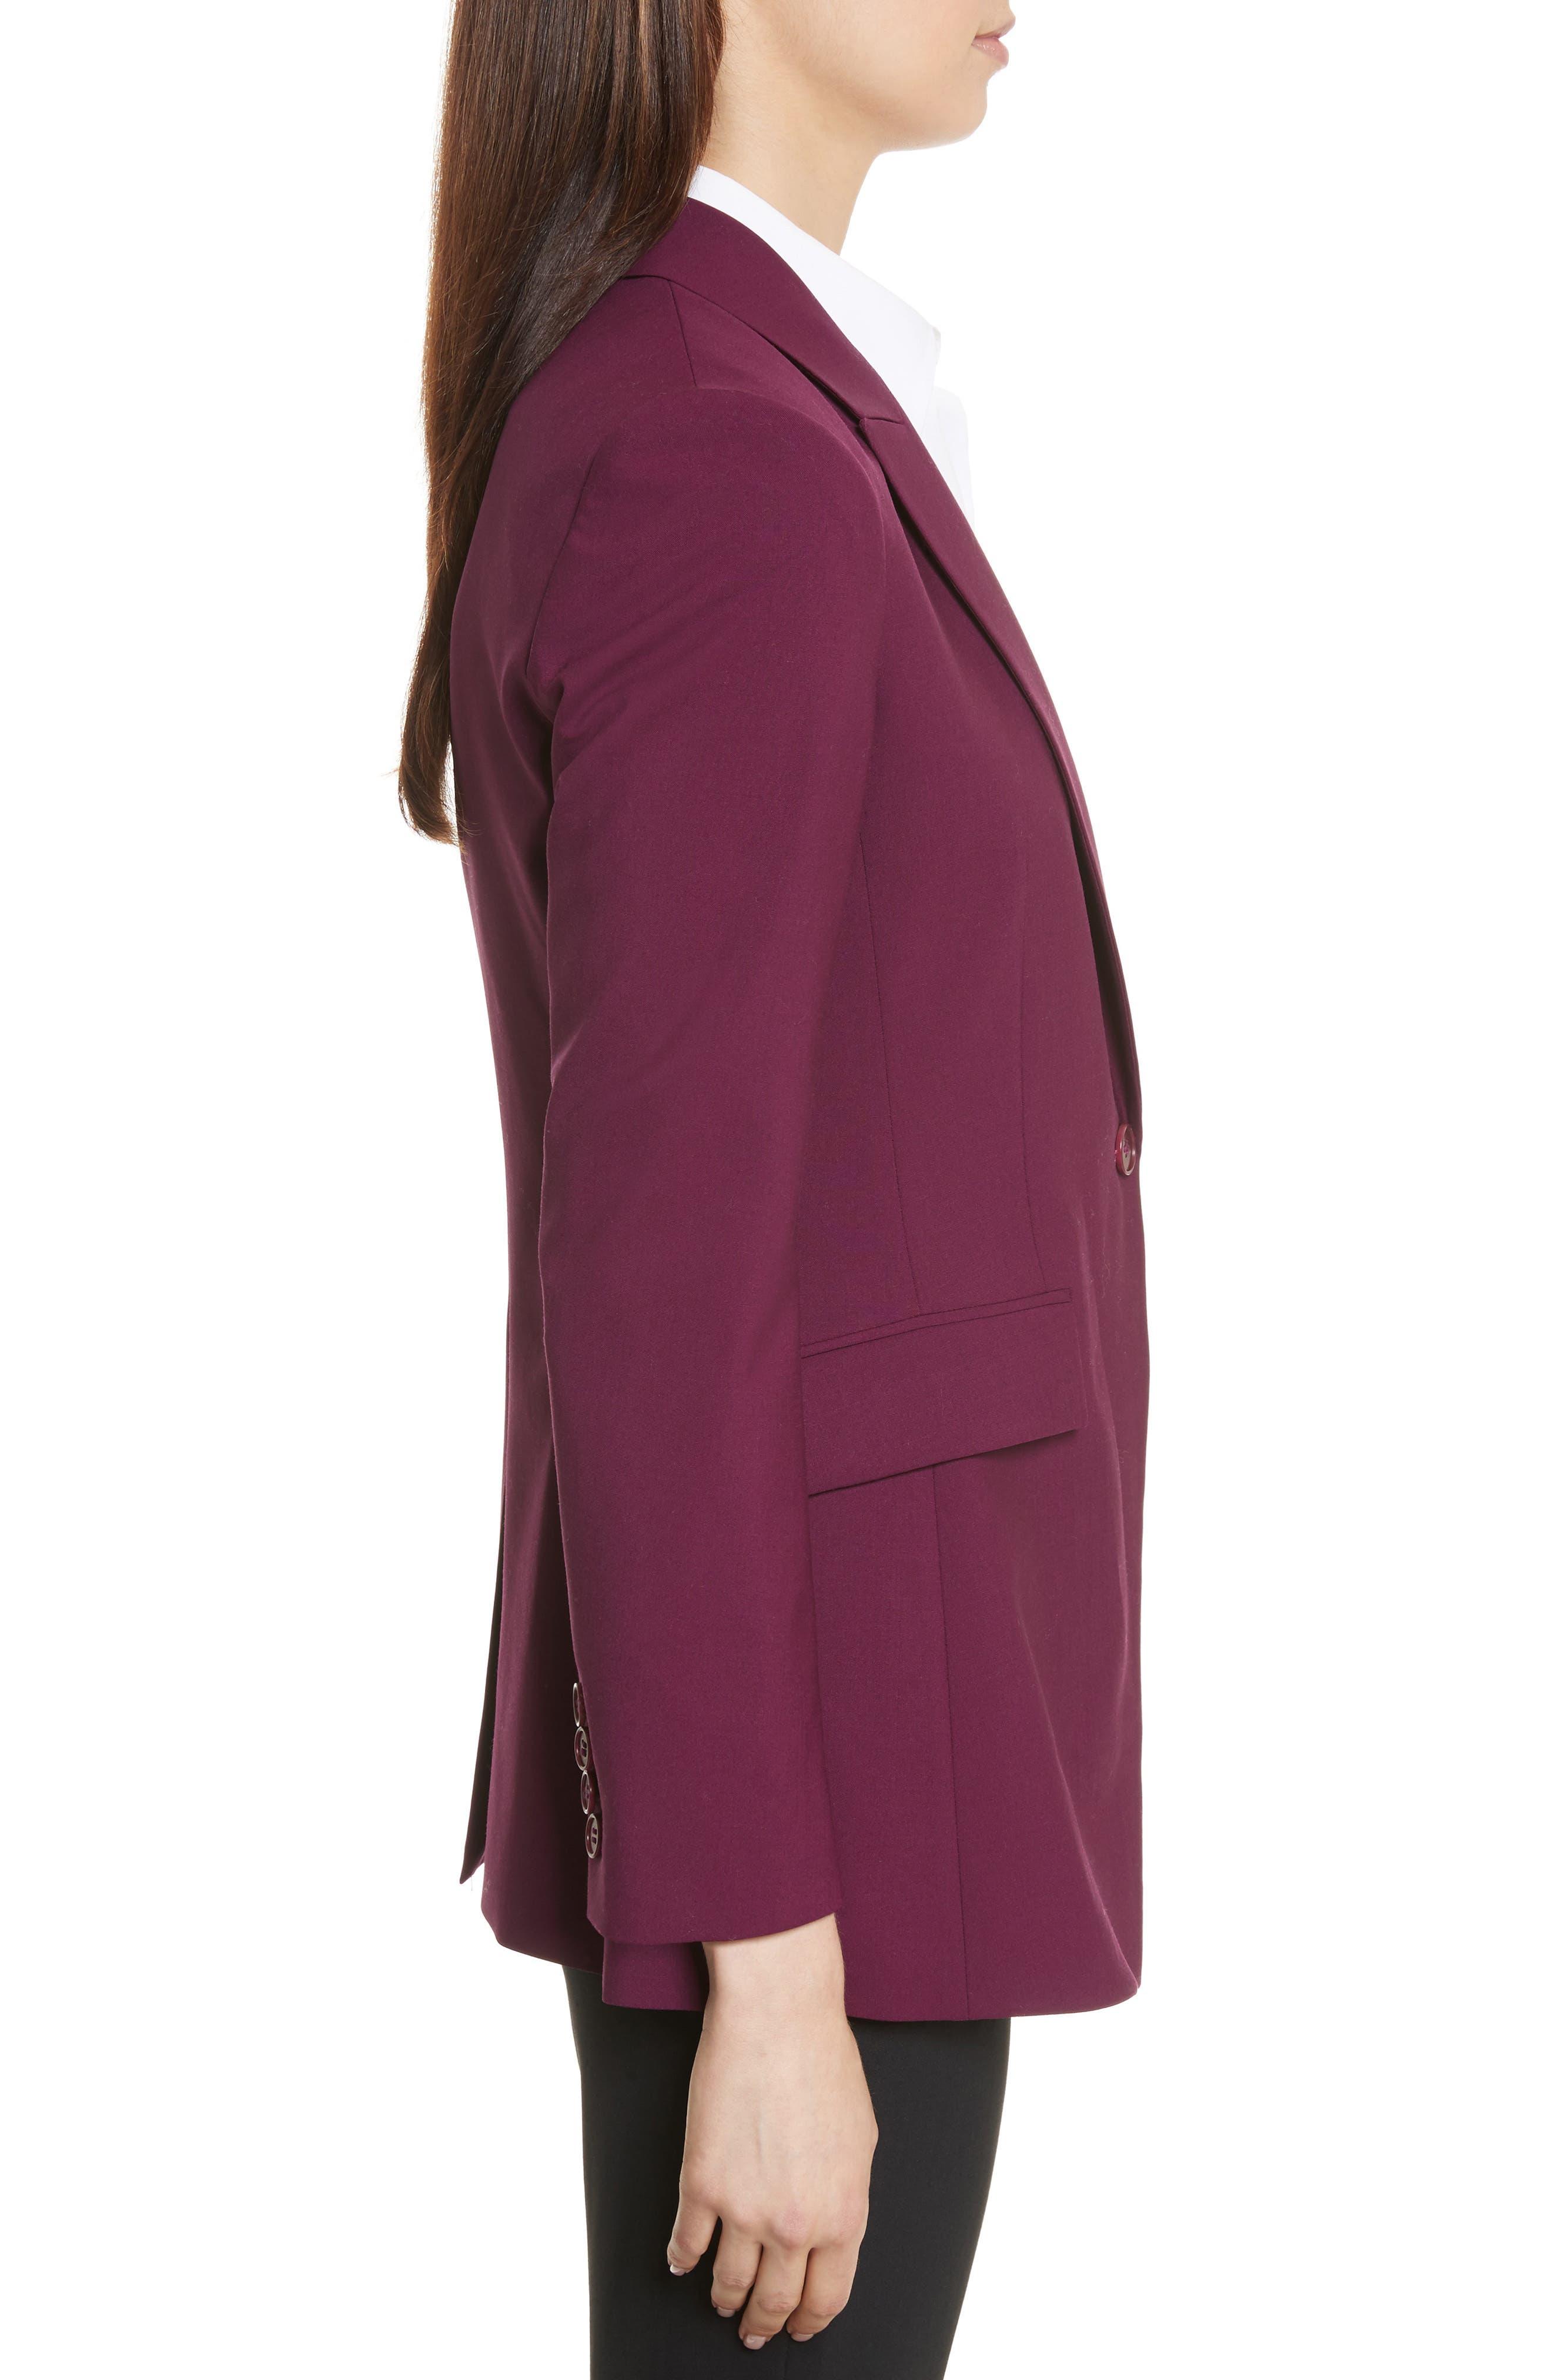 Etienette B Good Wool Suit Jacket,                             Alternate thumbnail 21, color,